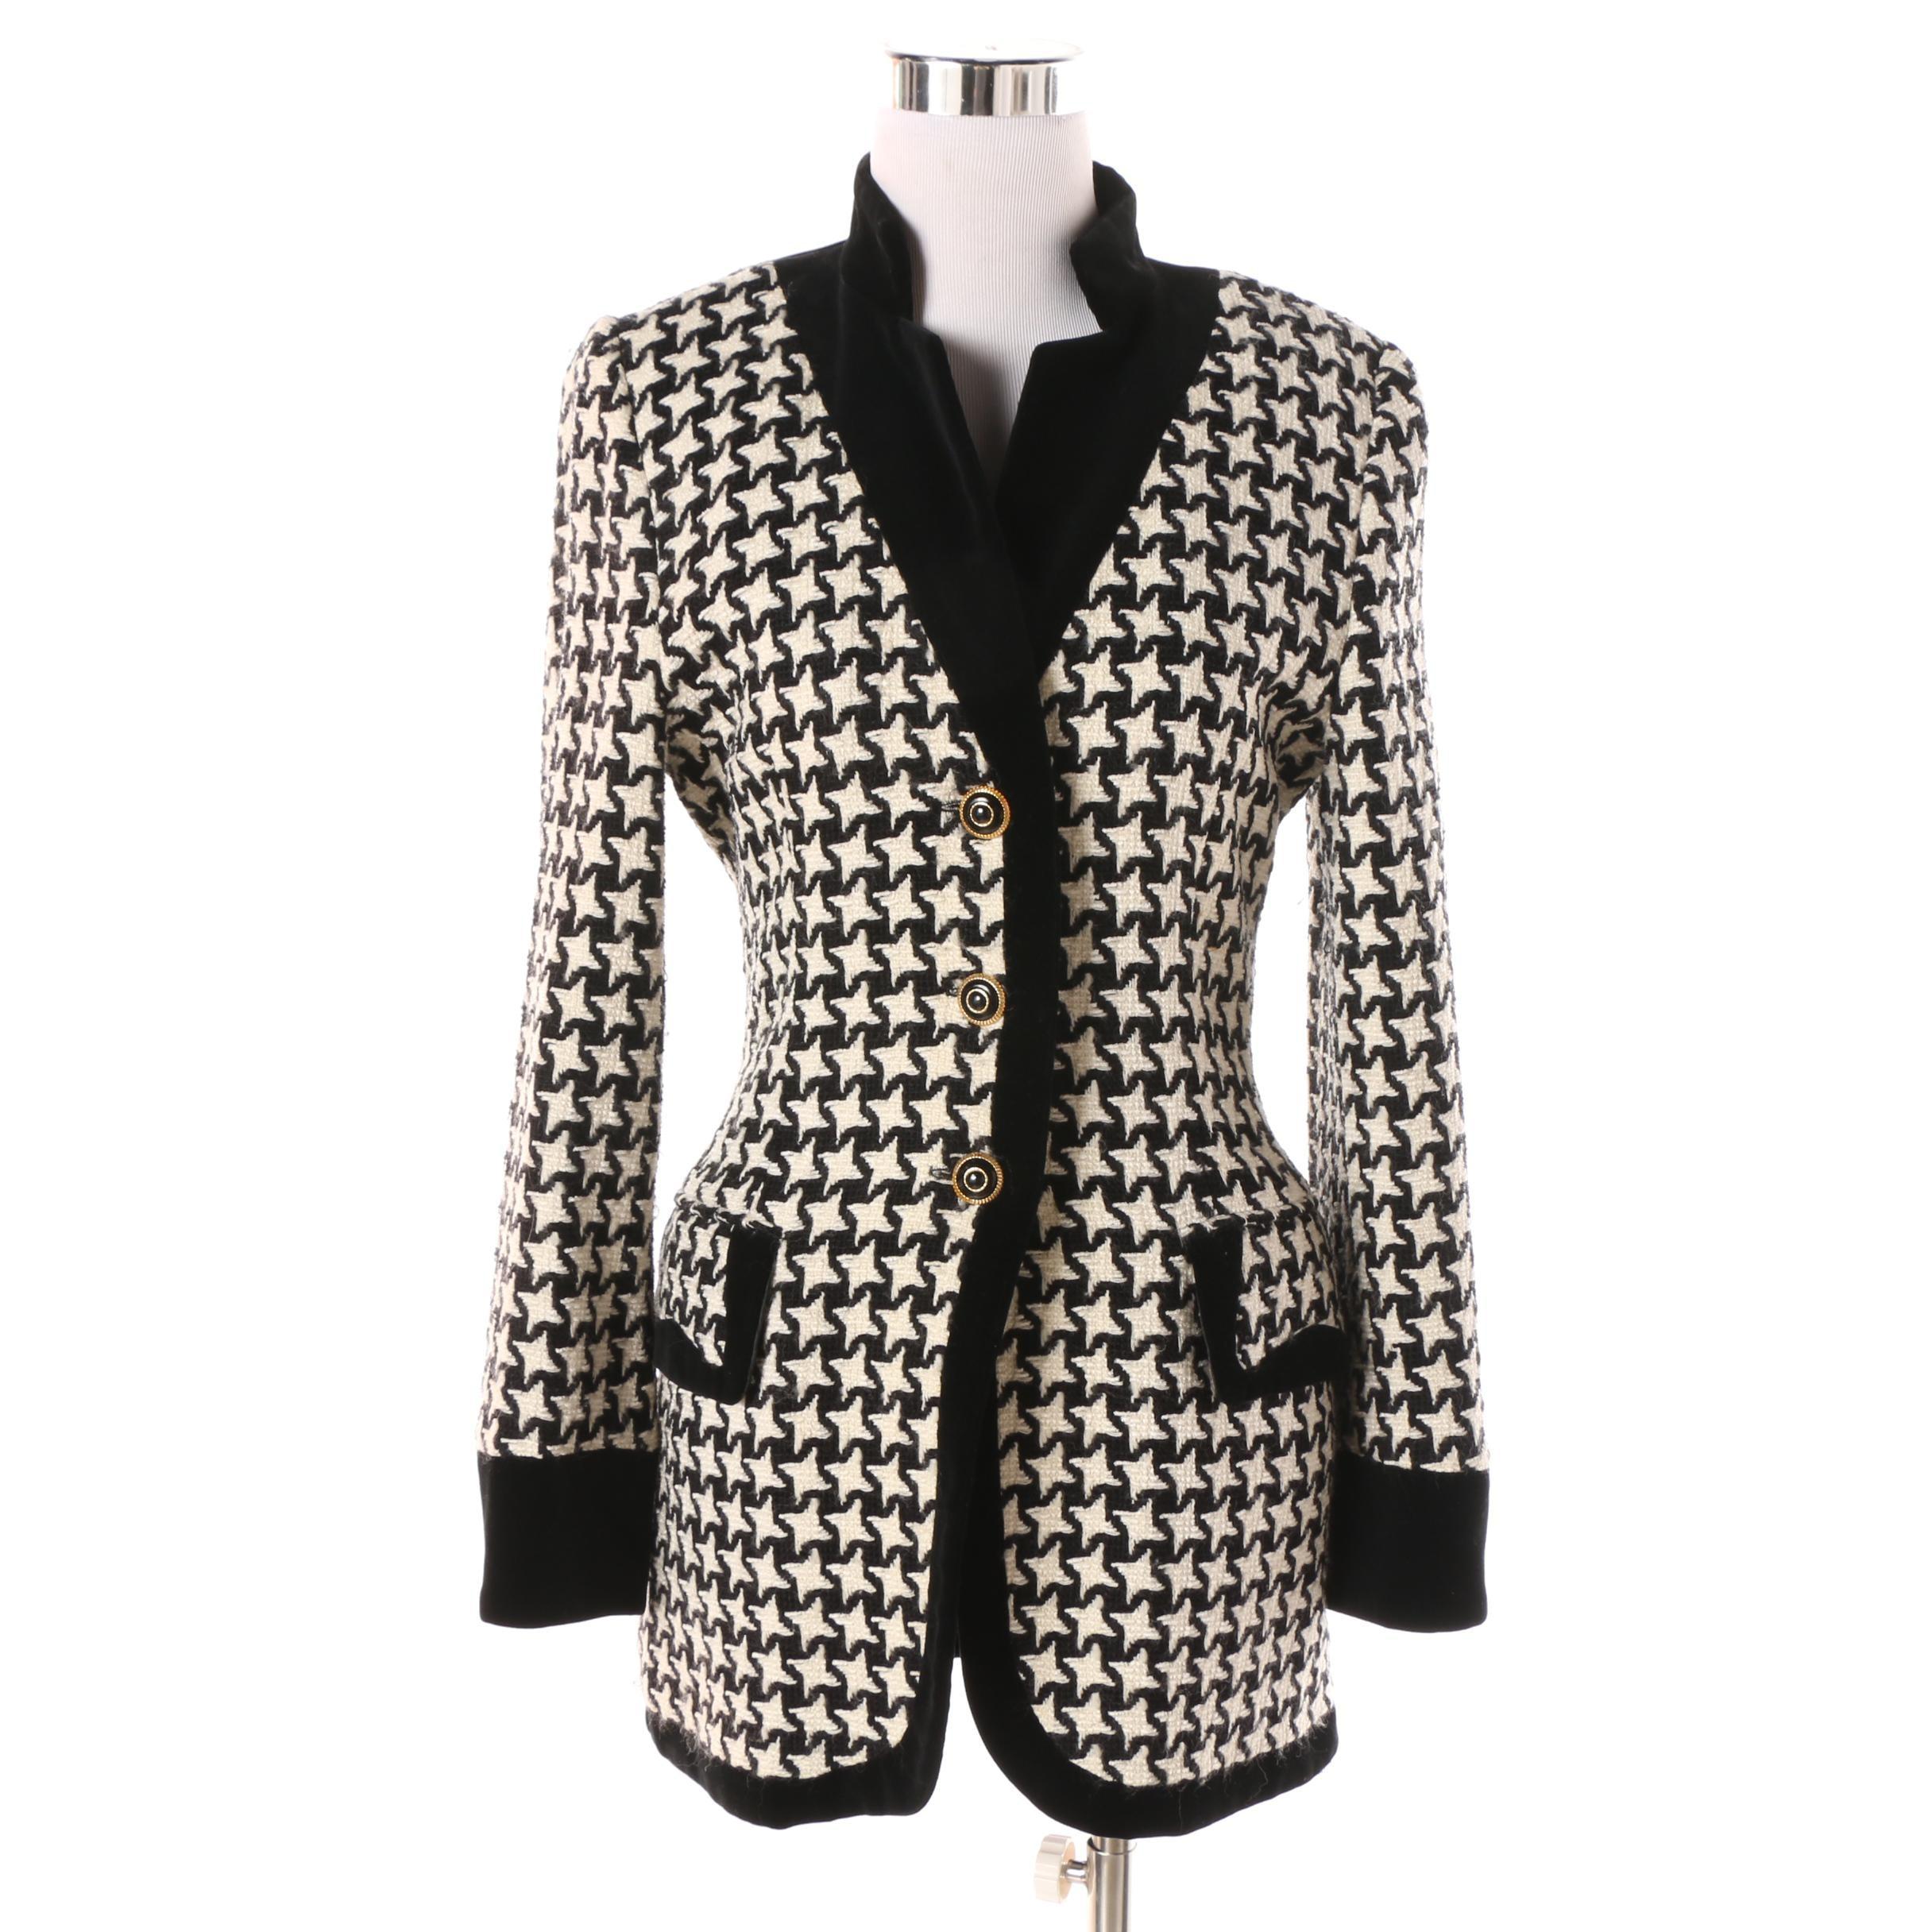 Women's Escada Velvet Trimmed Black and White Wool Blend Houndstooth Jacket